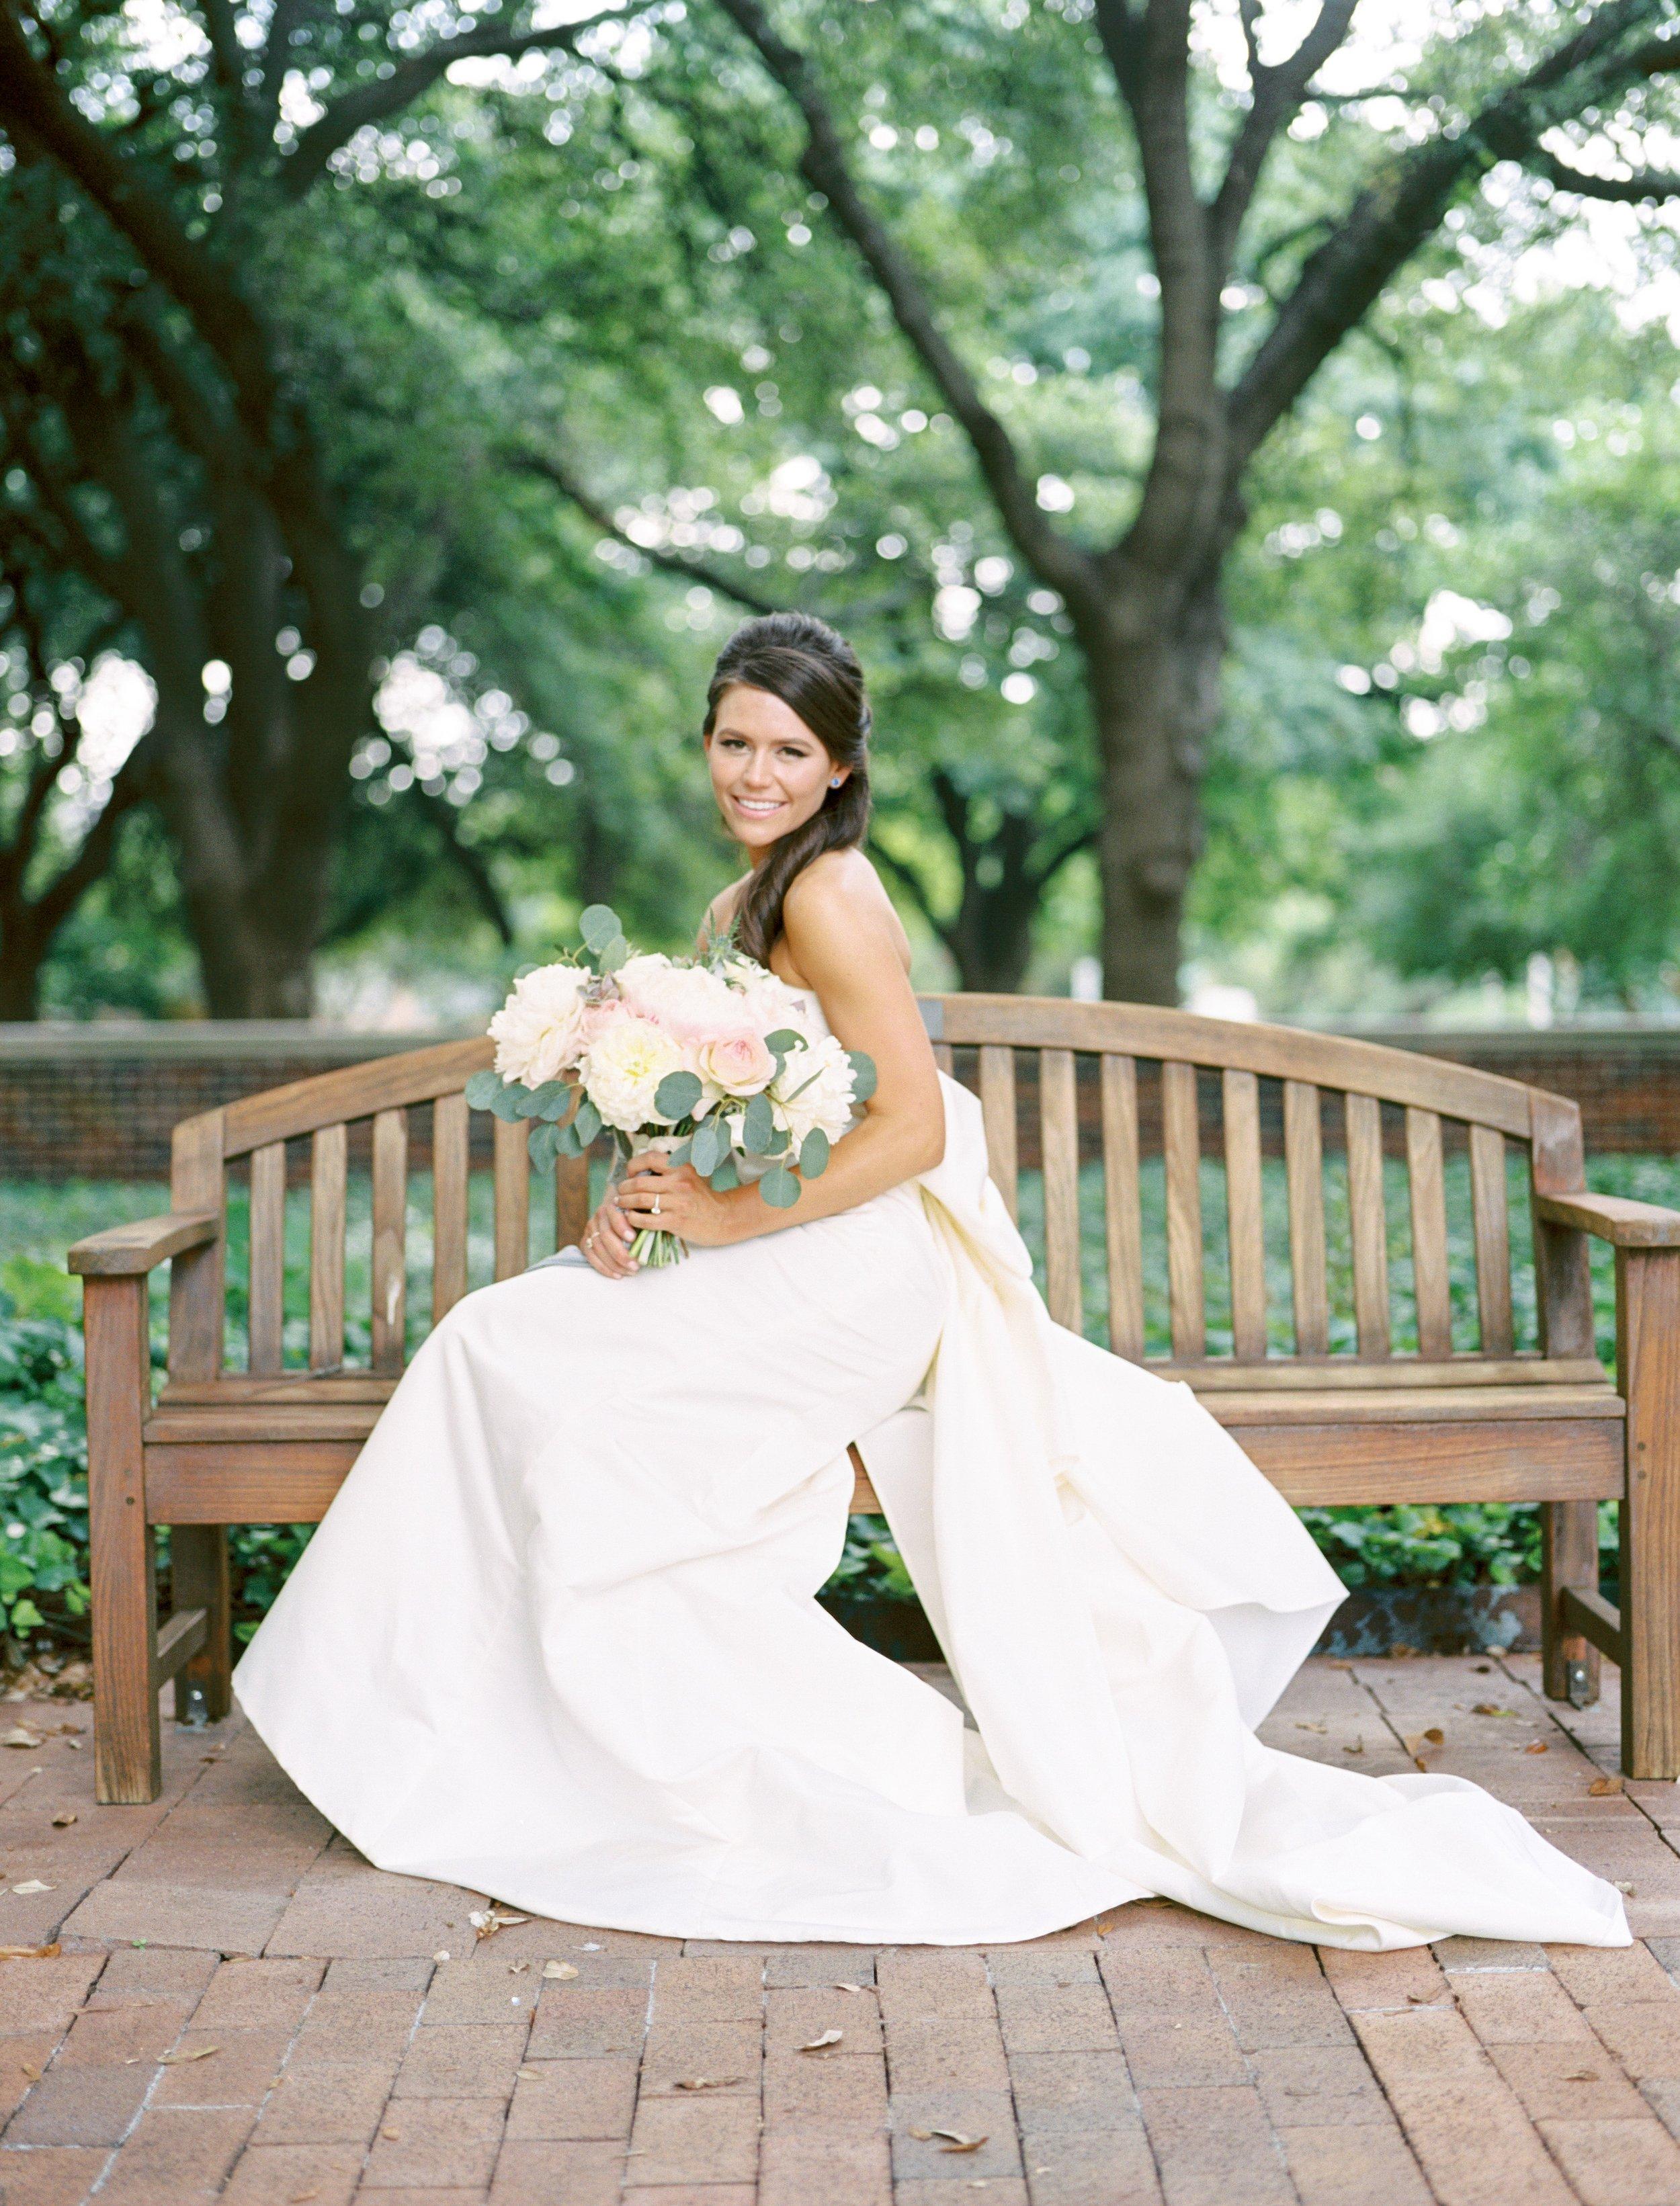 Megan   Gentry gown | Dallas, TX | 2016    Ben Q Photography